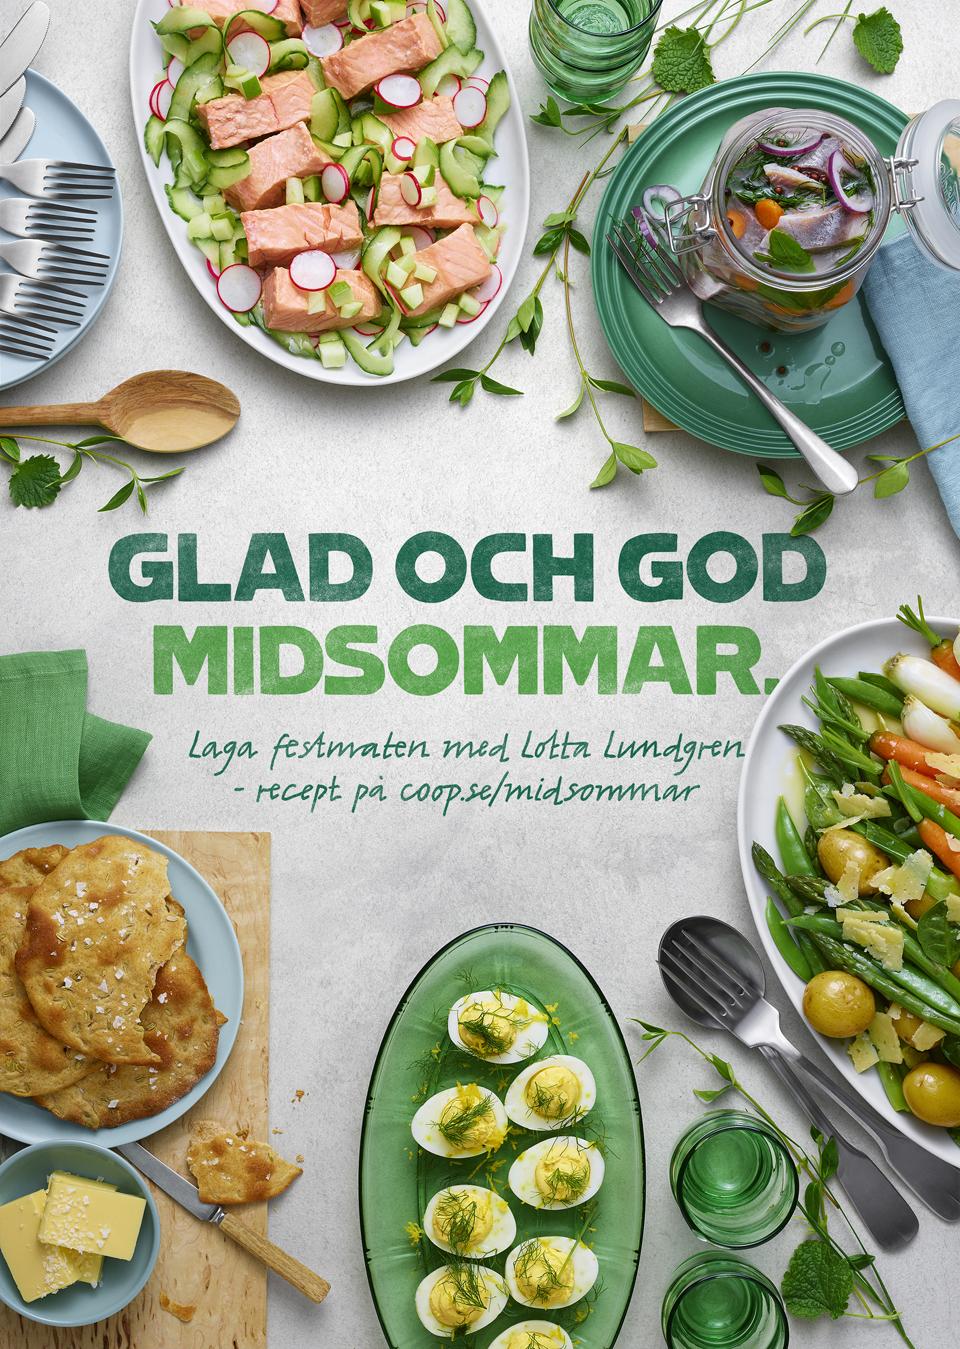 Coop_Midsommarbord_Affisch_2017_Text